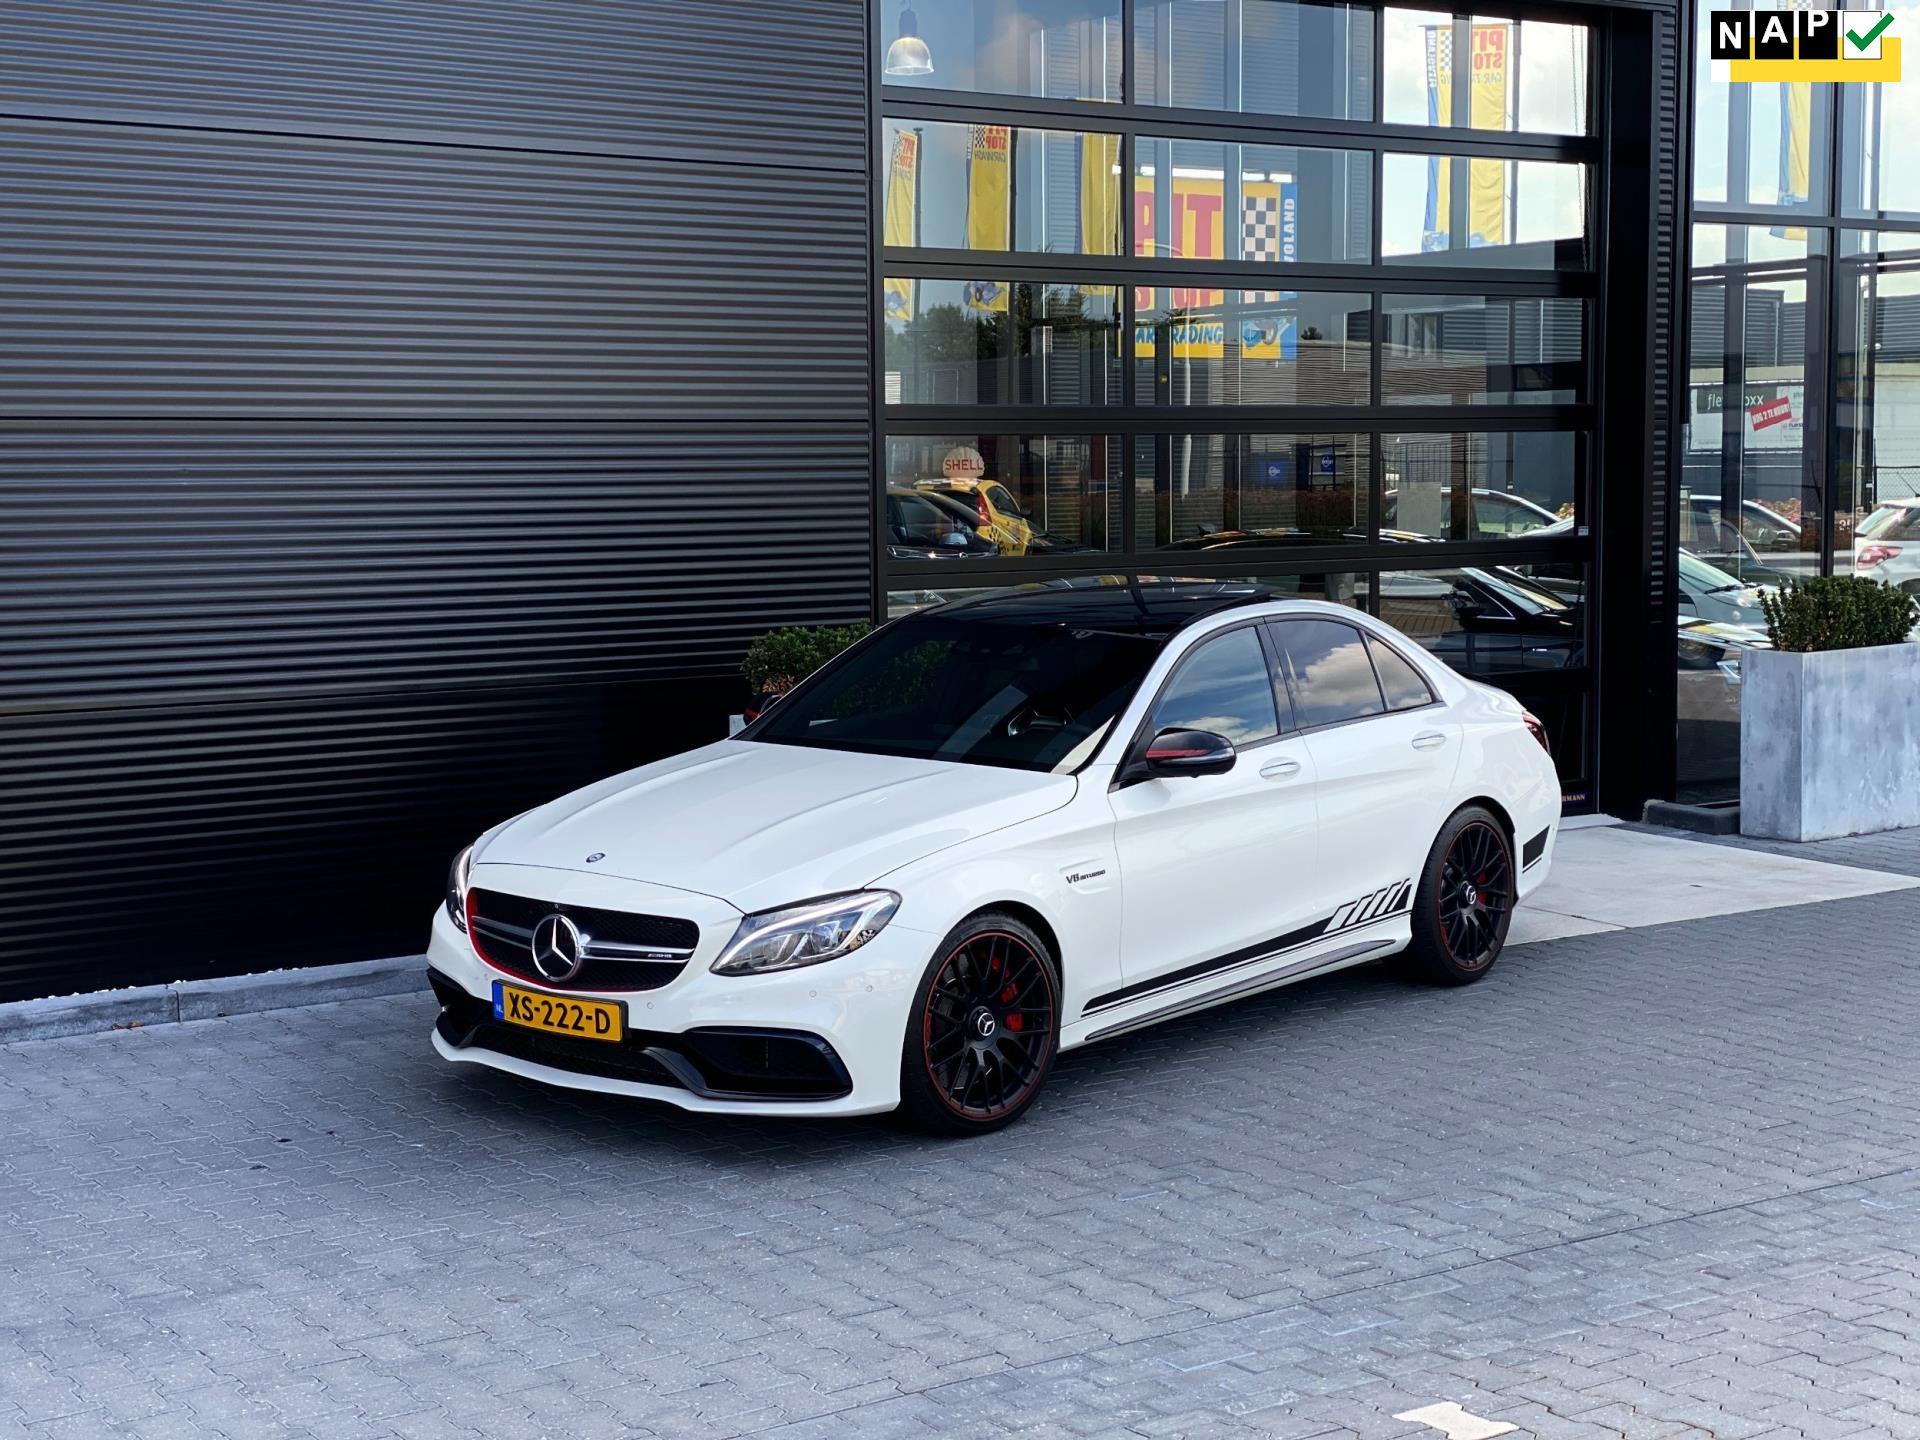 Mercedes-Benz C-klasse occasion - Pitstop Car Trading